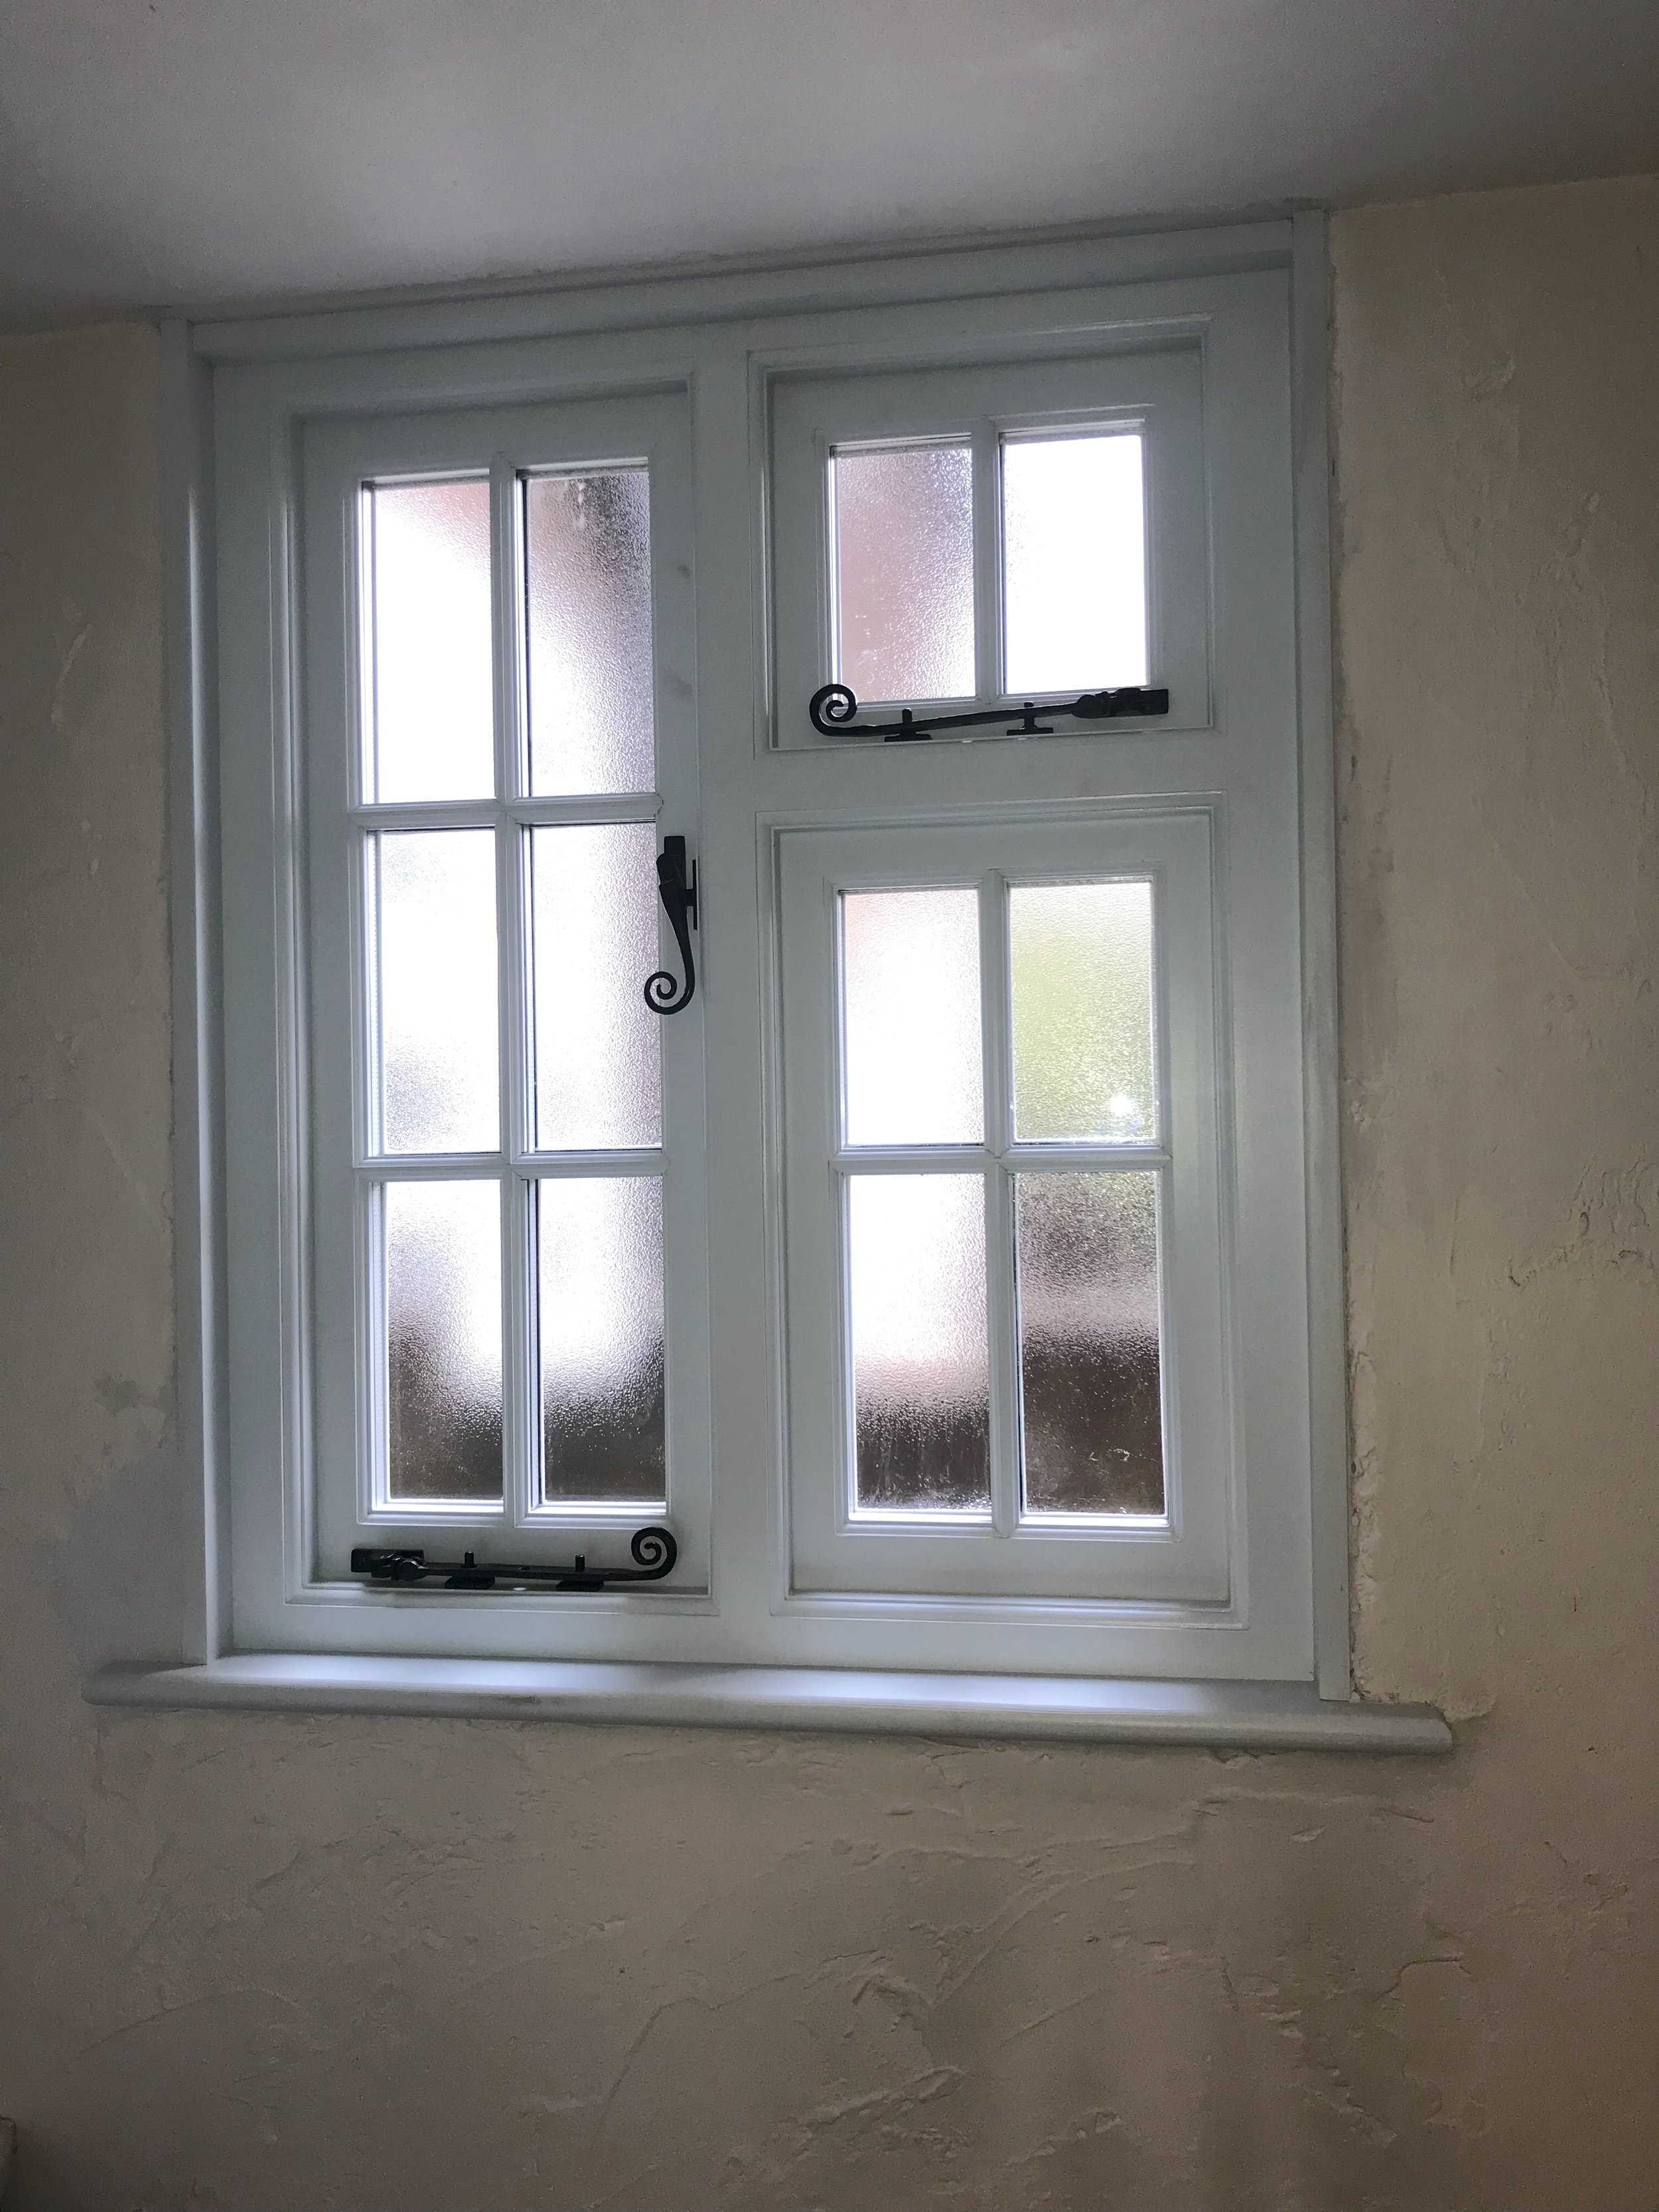 P loo window.jpg